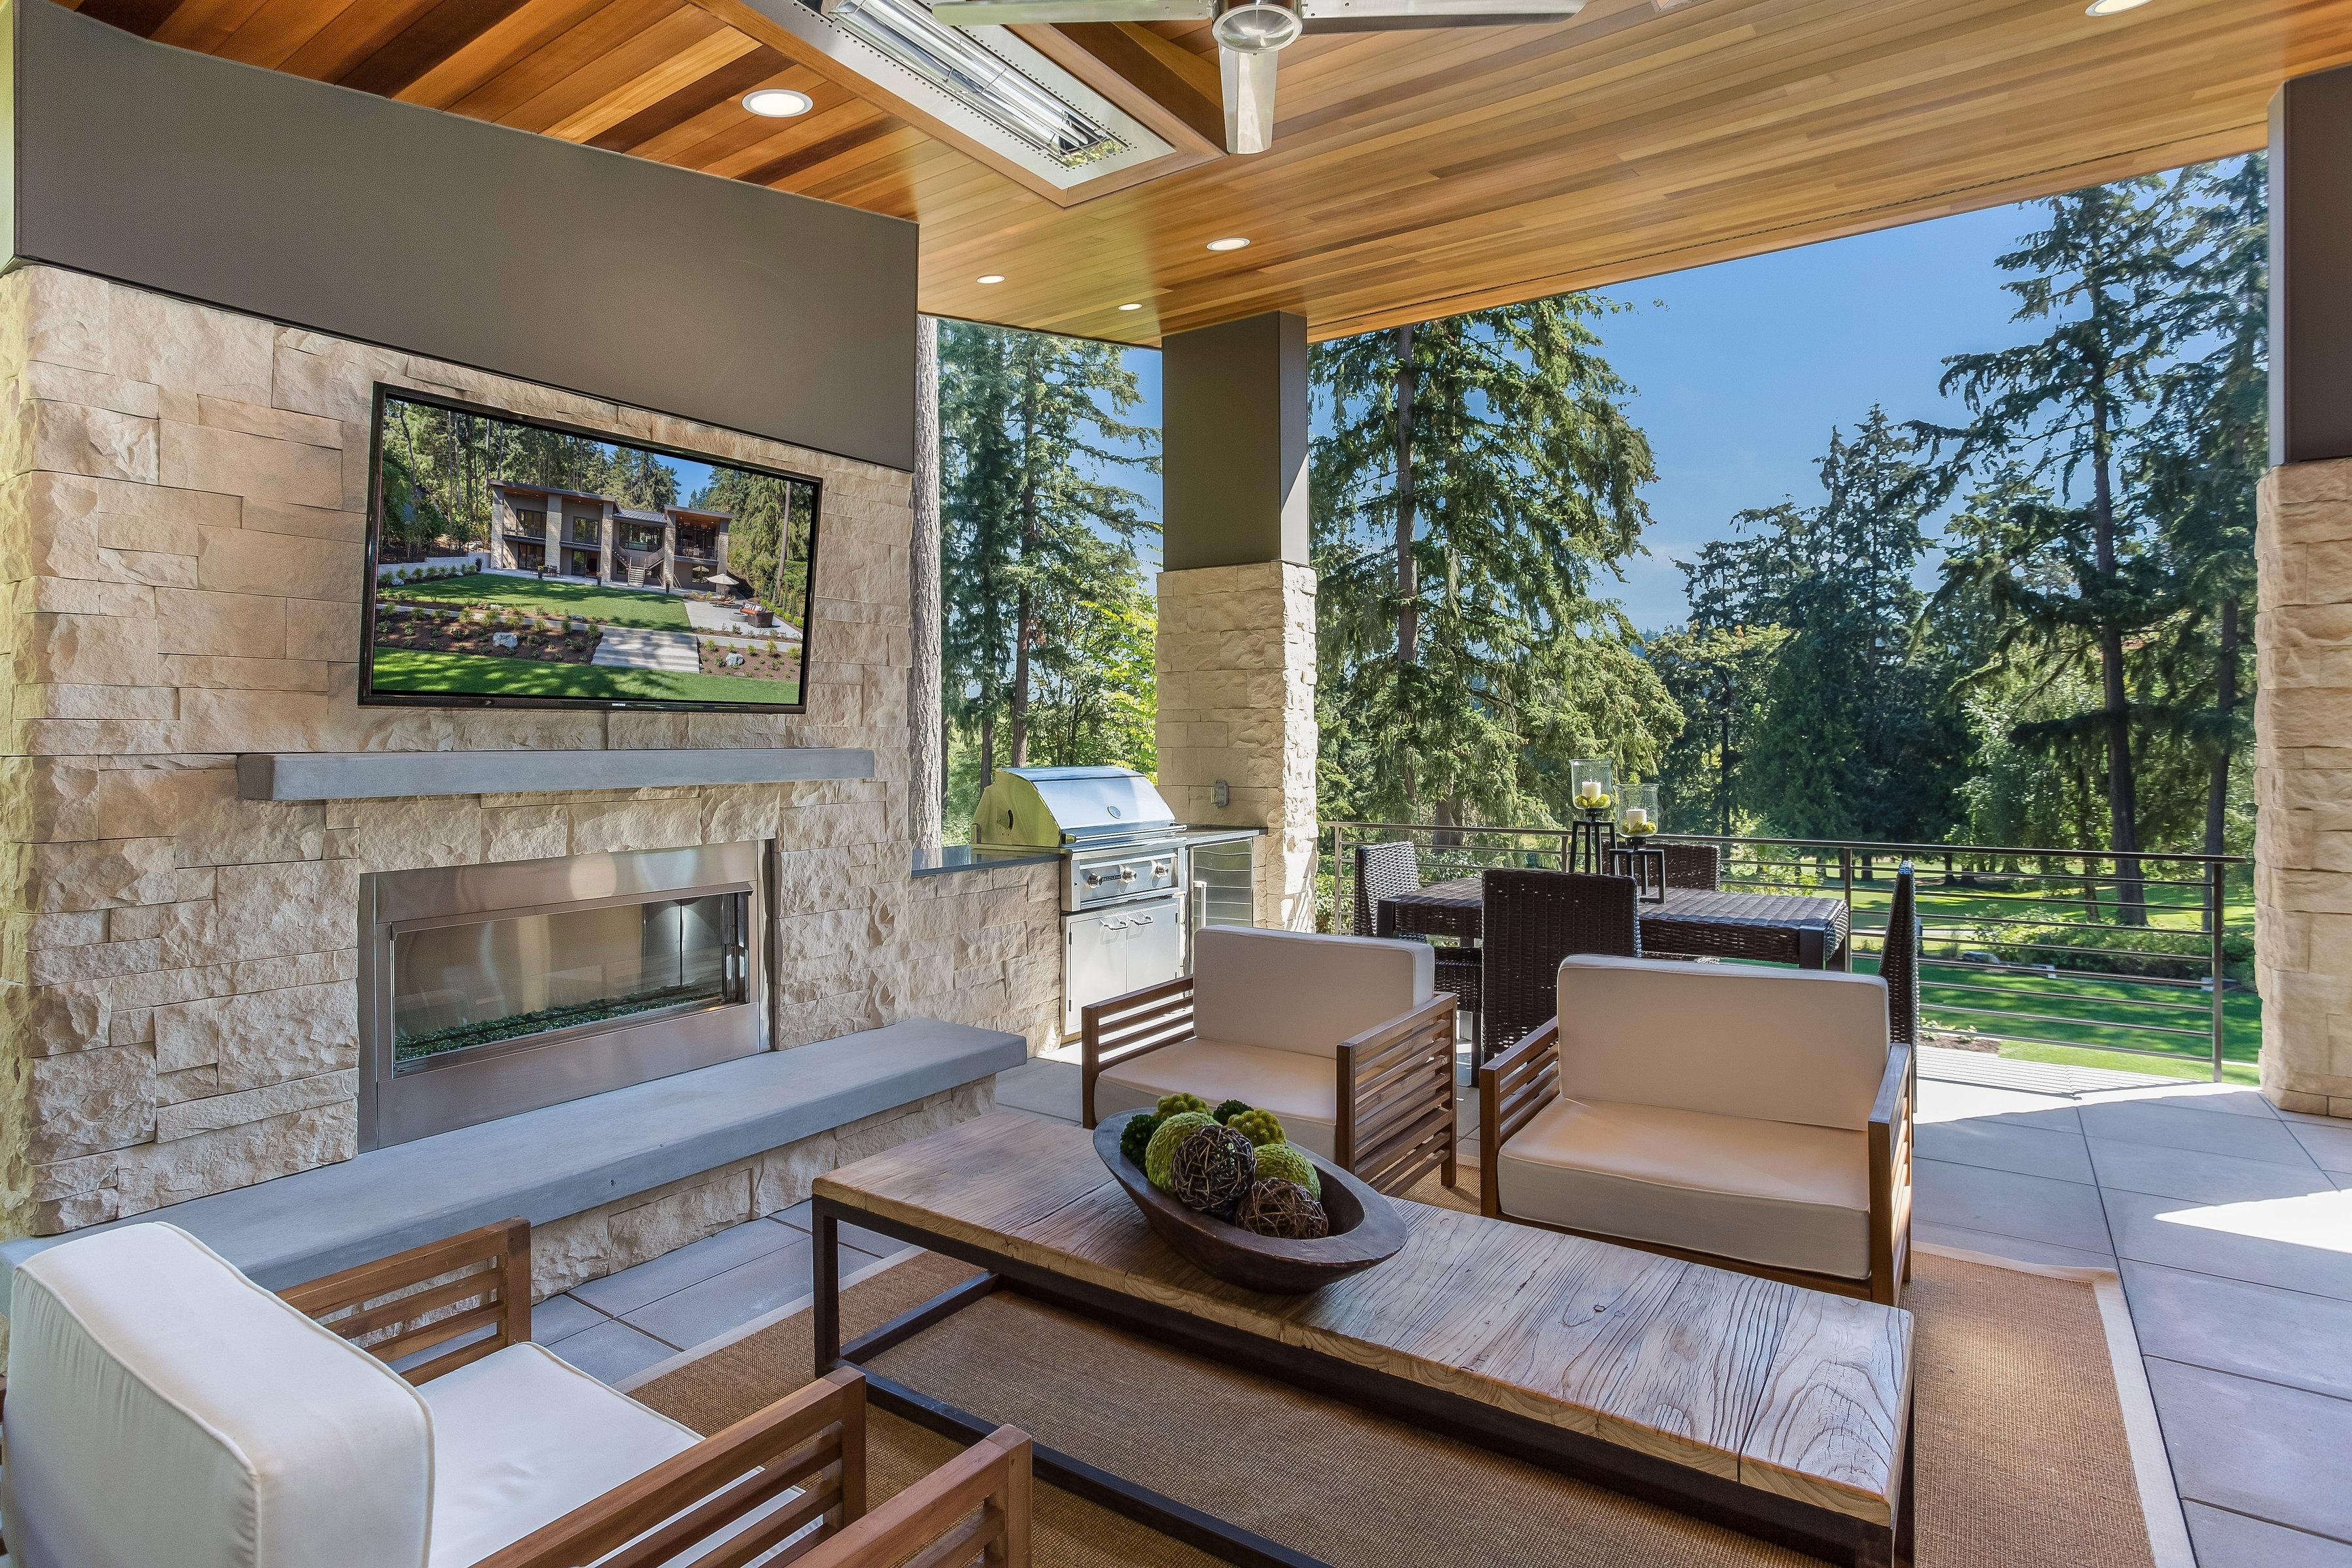 Trend Eldorado Stone Outdoor Kitchen